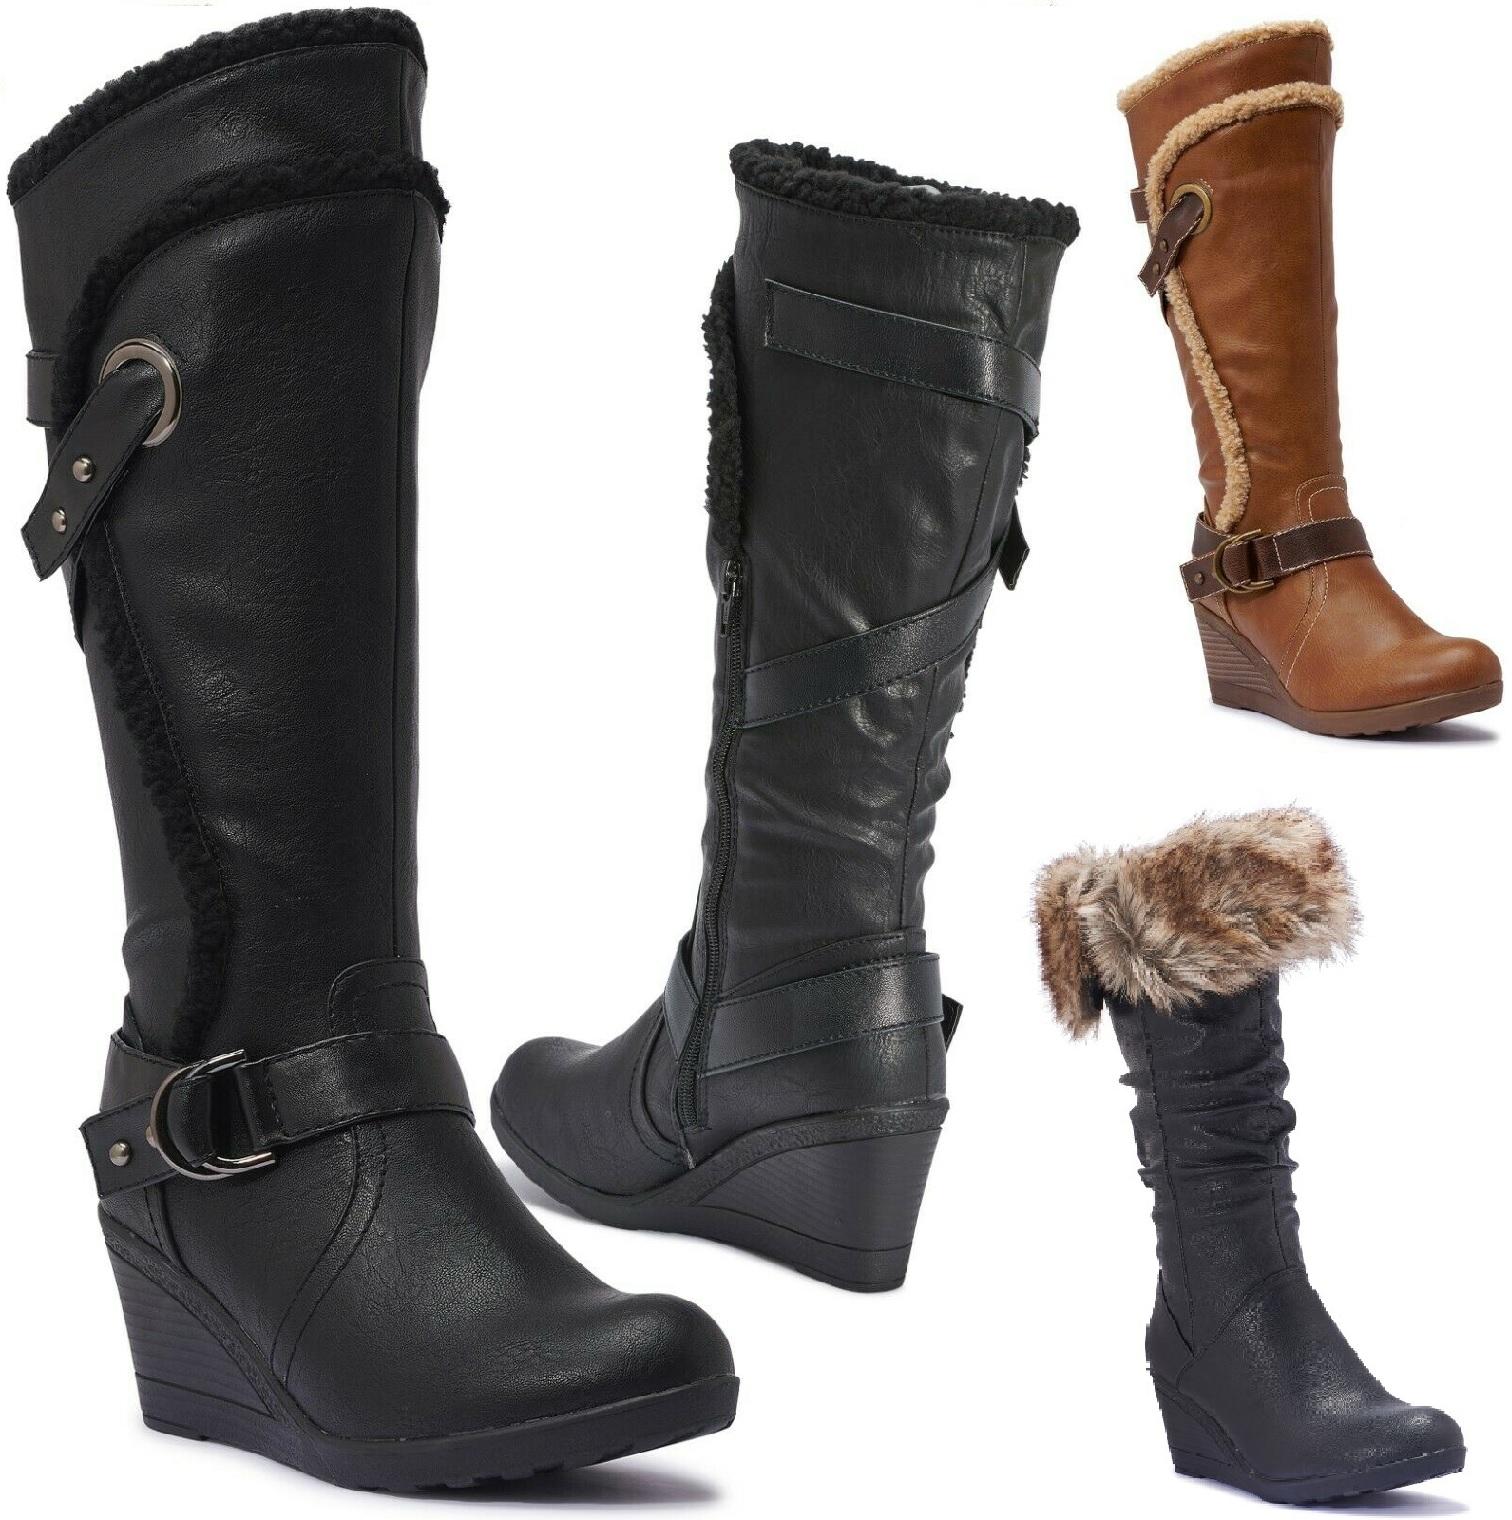 WOMEN FUR LINED WINTER WARM SHOES LADIES BUCKLE LOW HEEL MID CALF BOOTS SIZE 3-9